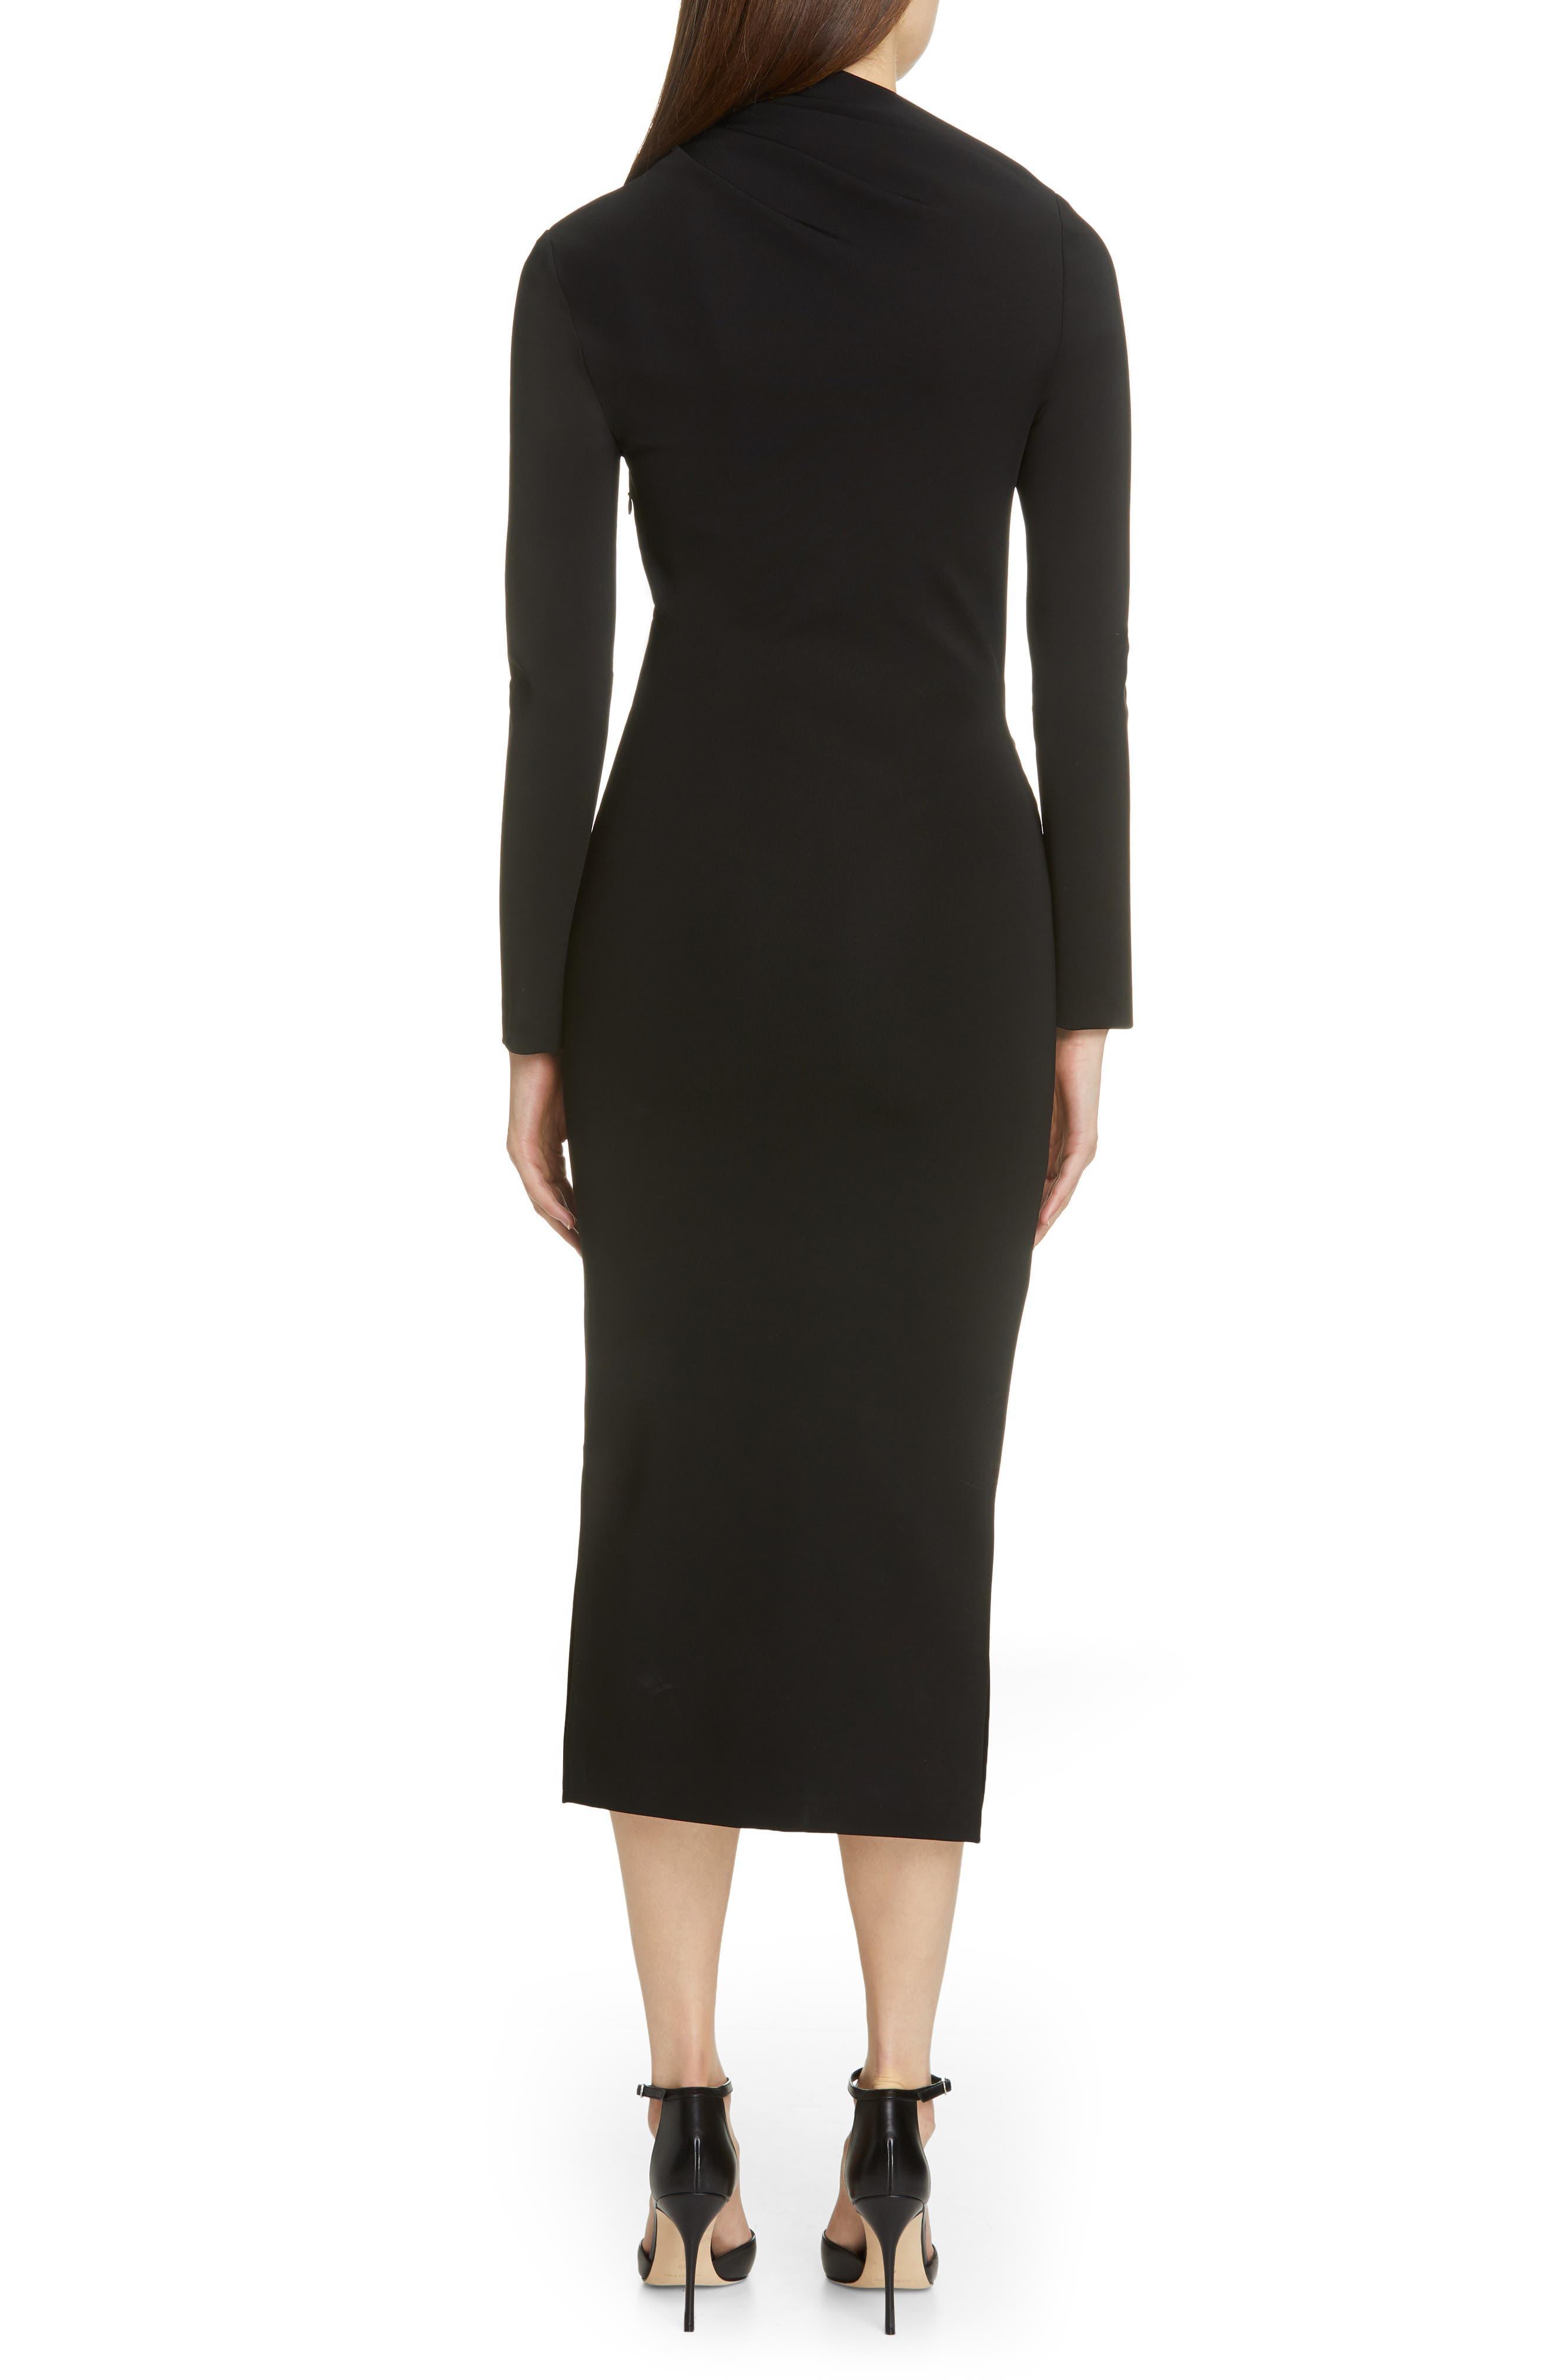 BRANDON MAXWELL, Side Drape Jersey Dress, Alternate thumbnail 2, color, BLACK